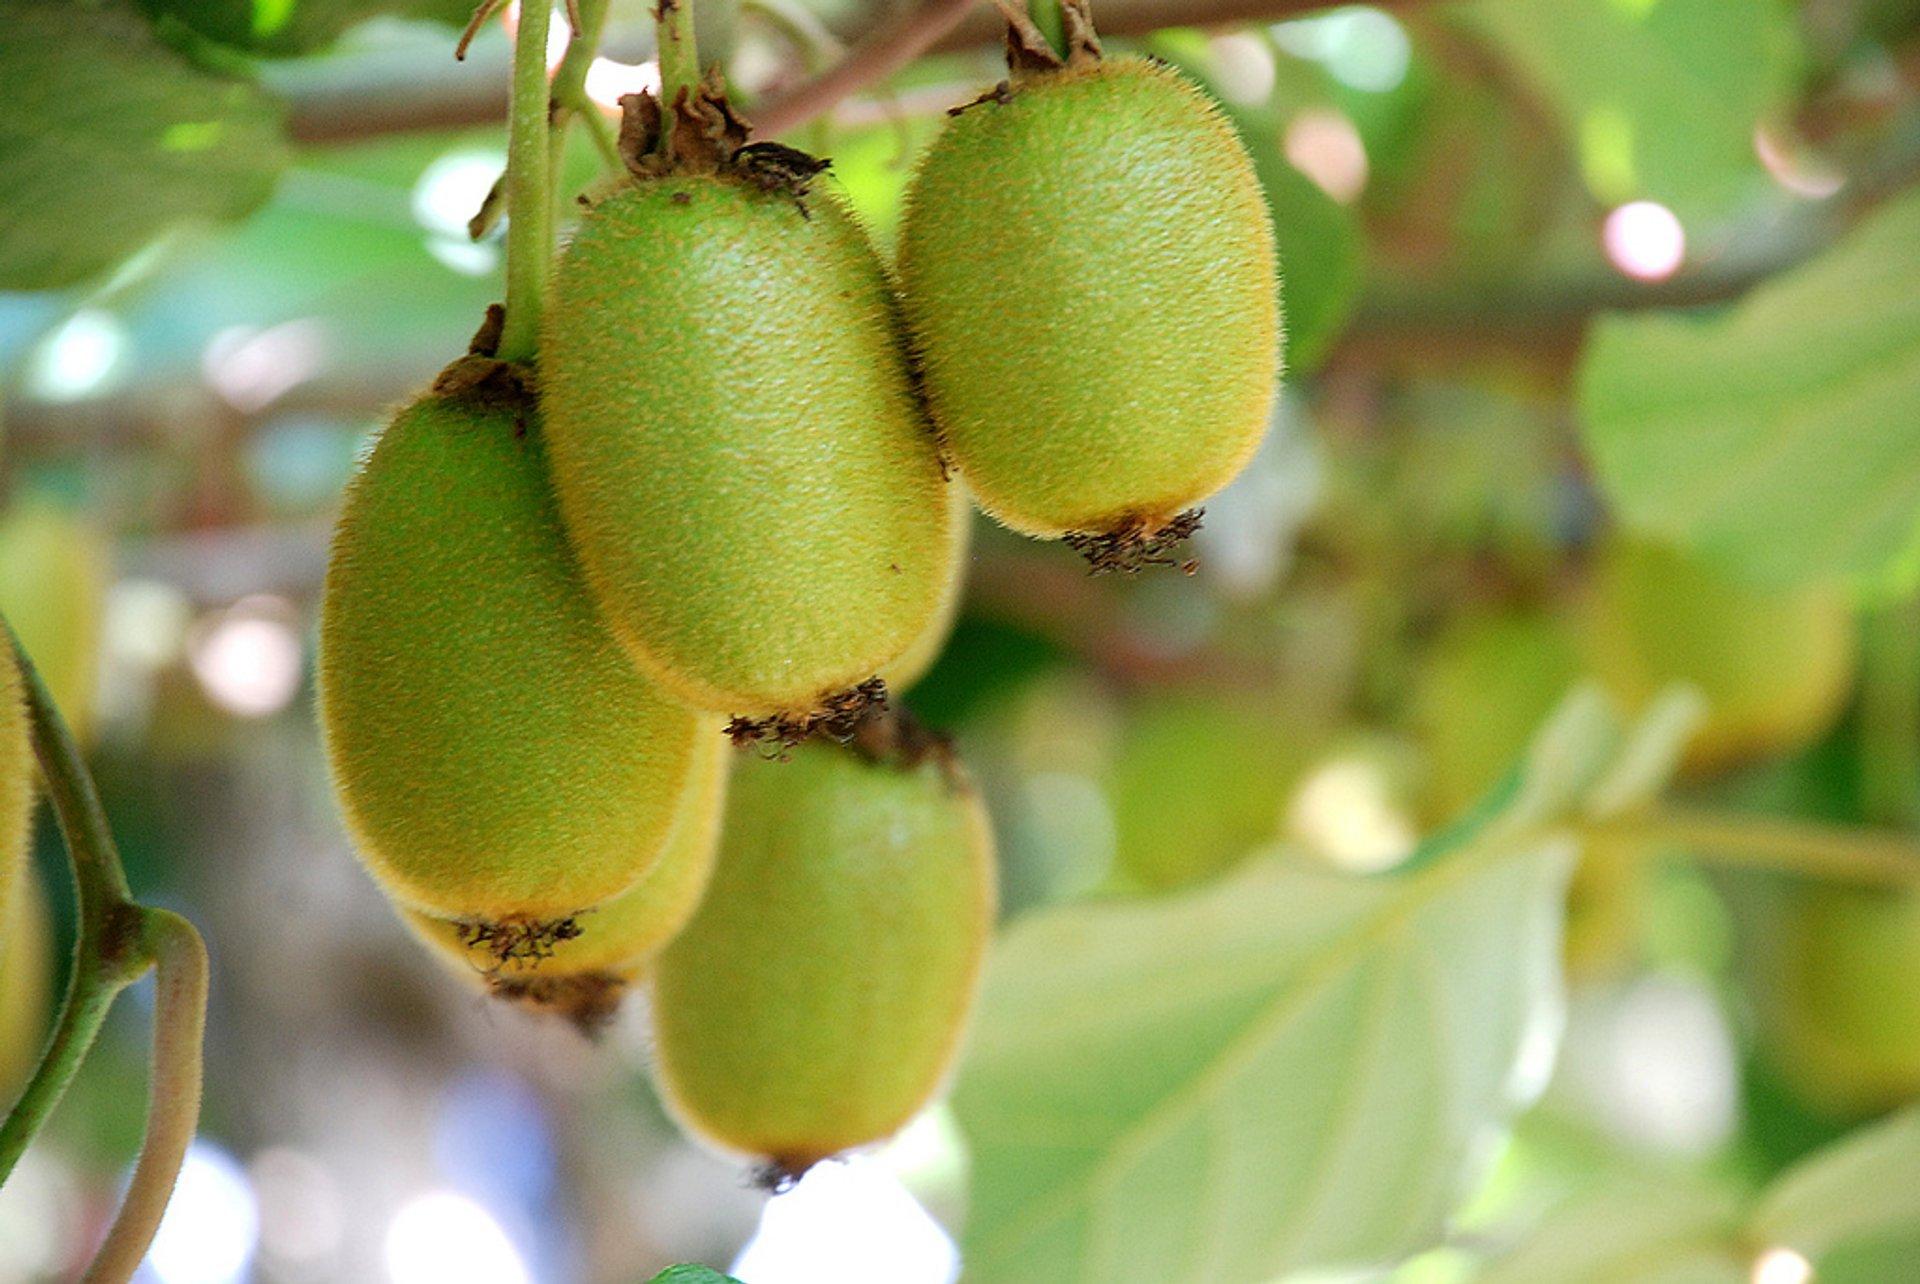 Golden Kiwifruit in New Zealand 2020 - Best Time